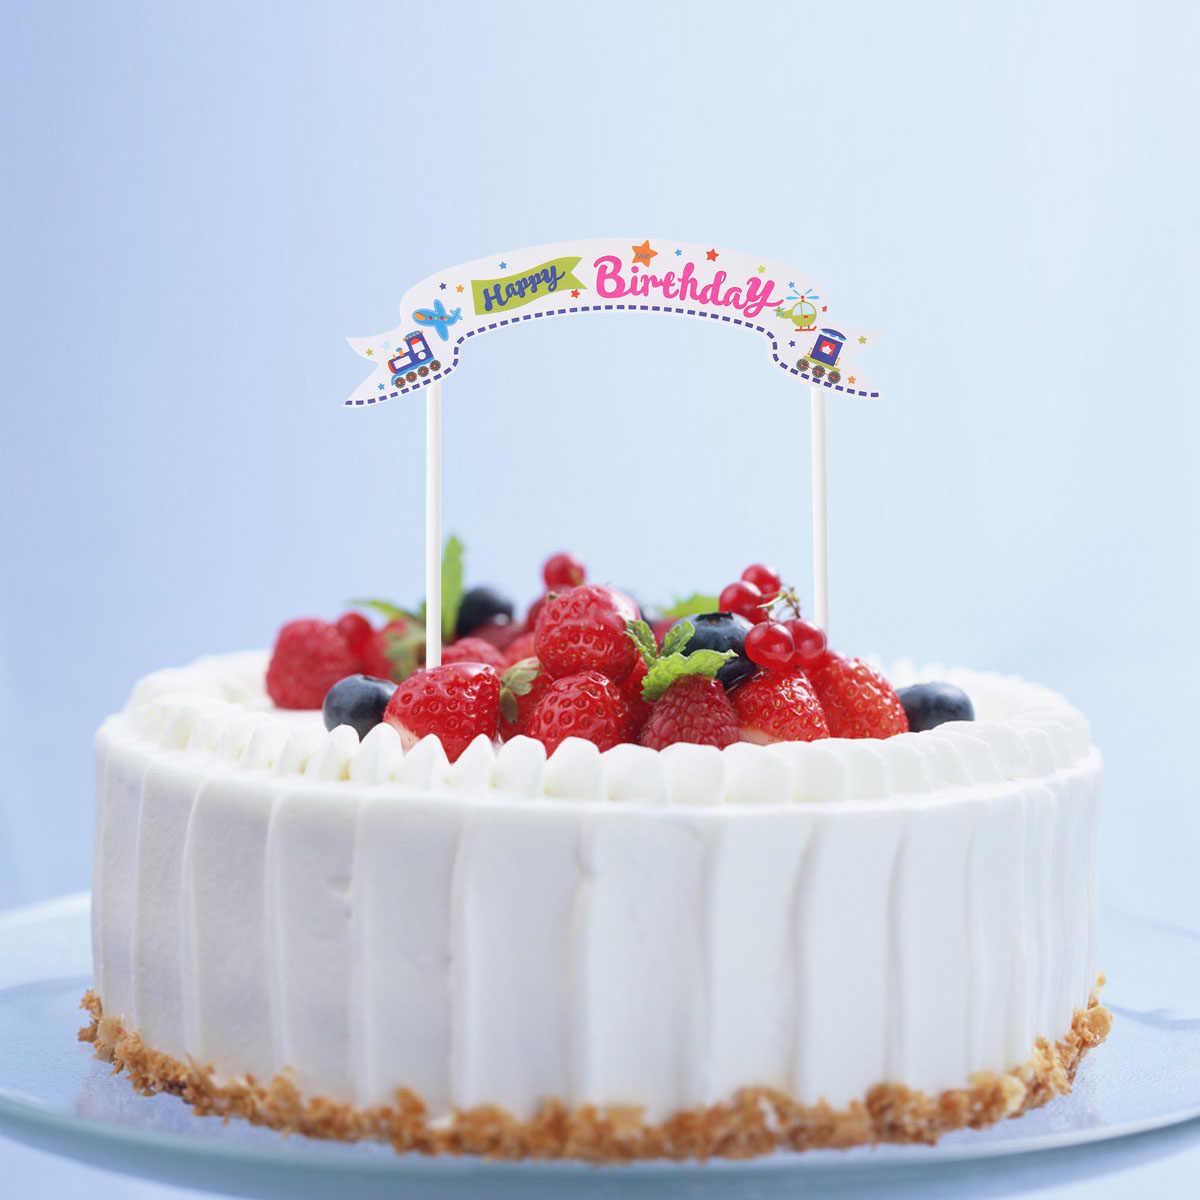 Tremendous Cupcake Toppers 5Pcs Happy Birthday Cake Toppers Flag Banner Personalised Birthday Cards Paralily Jamesorg